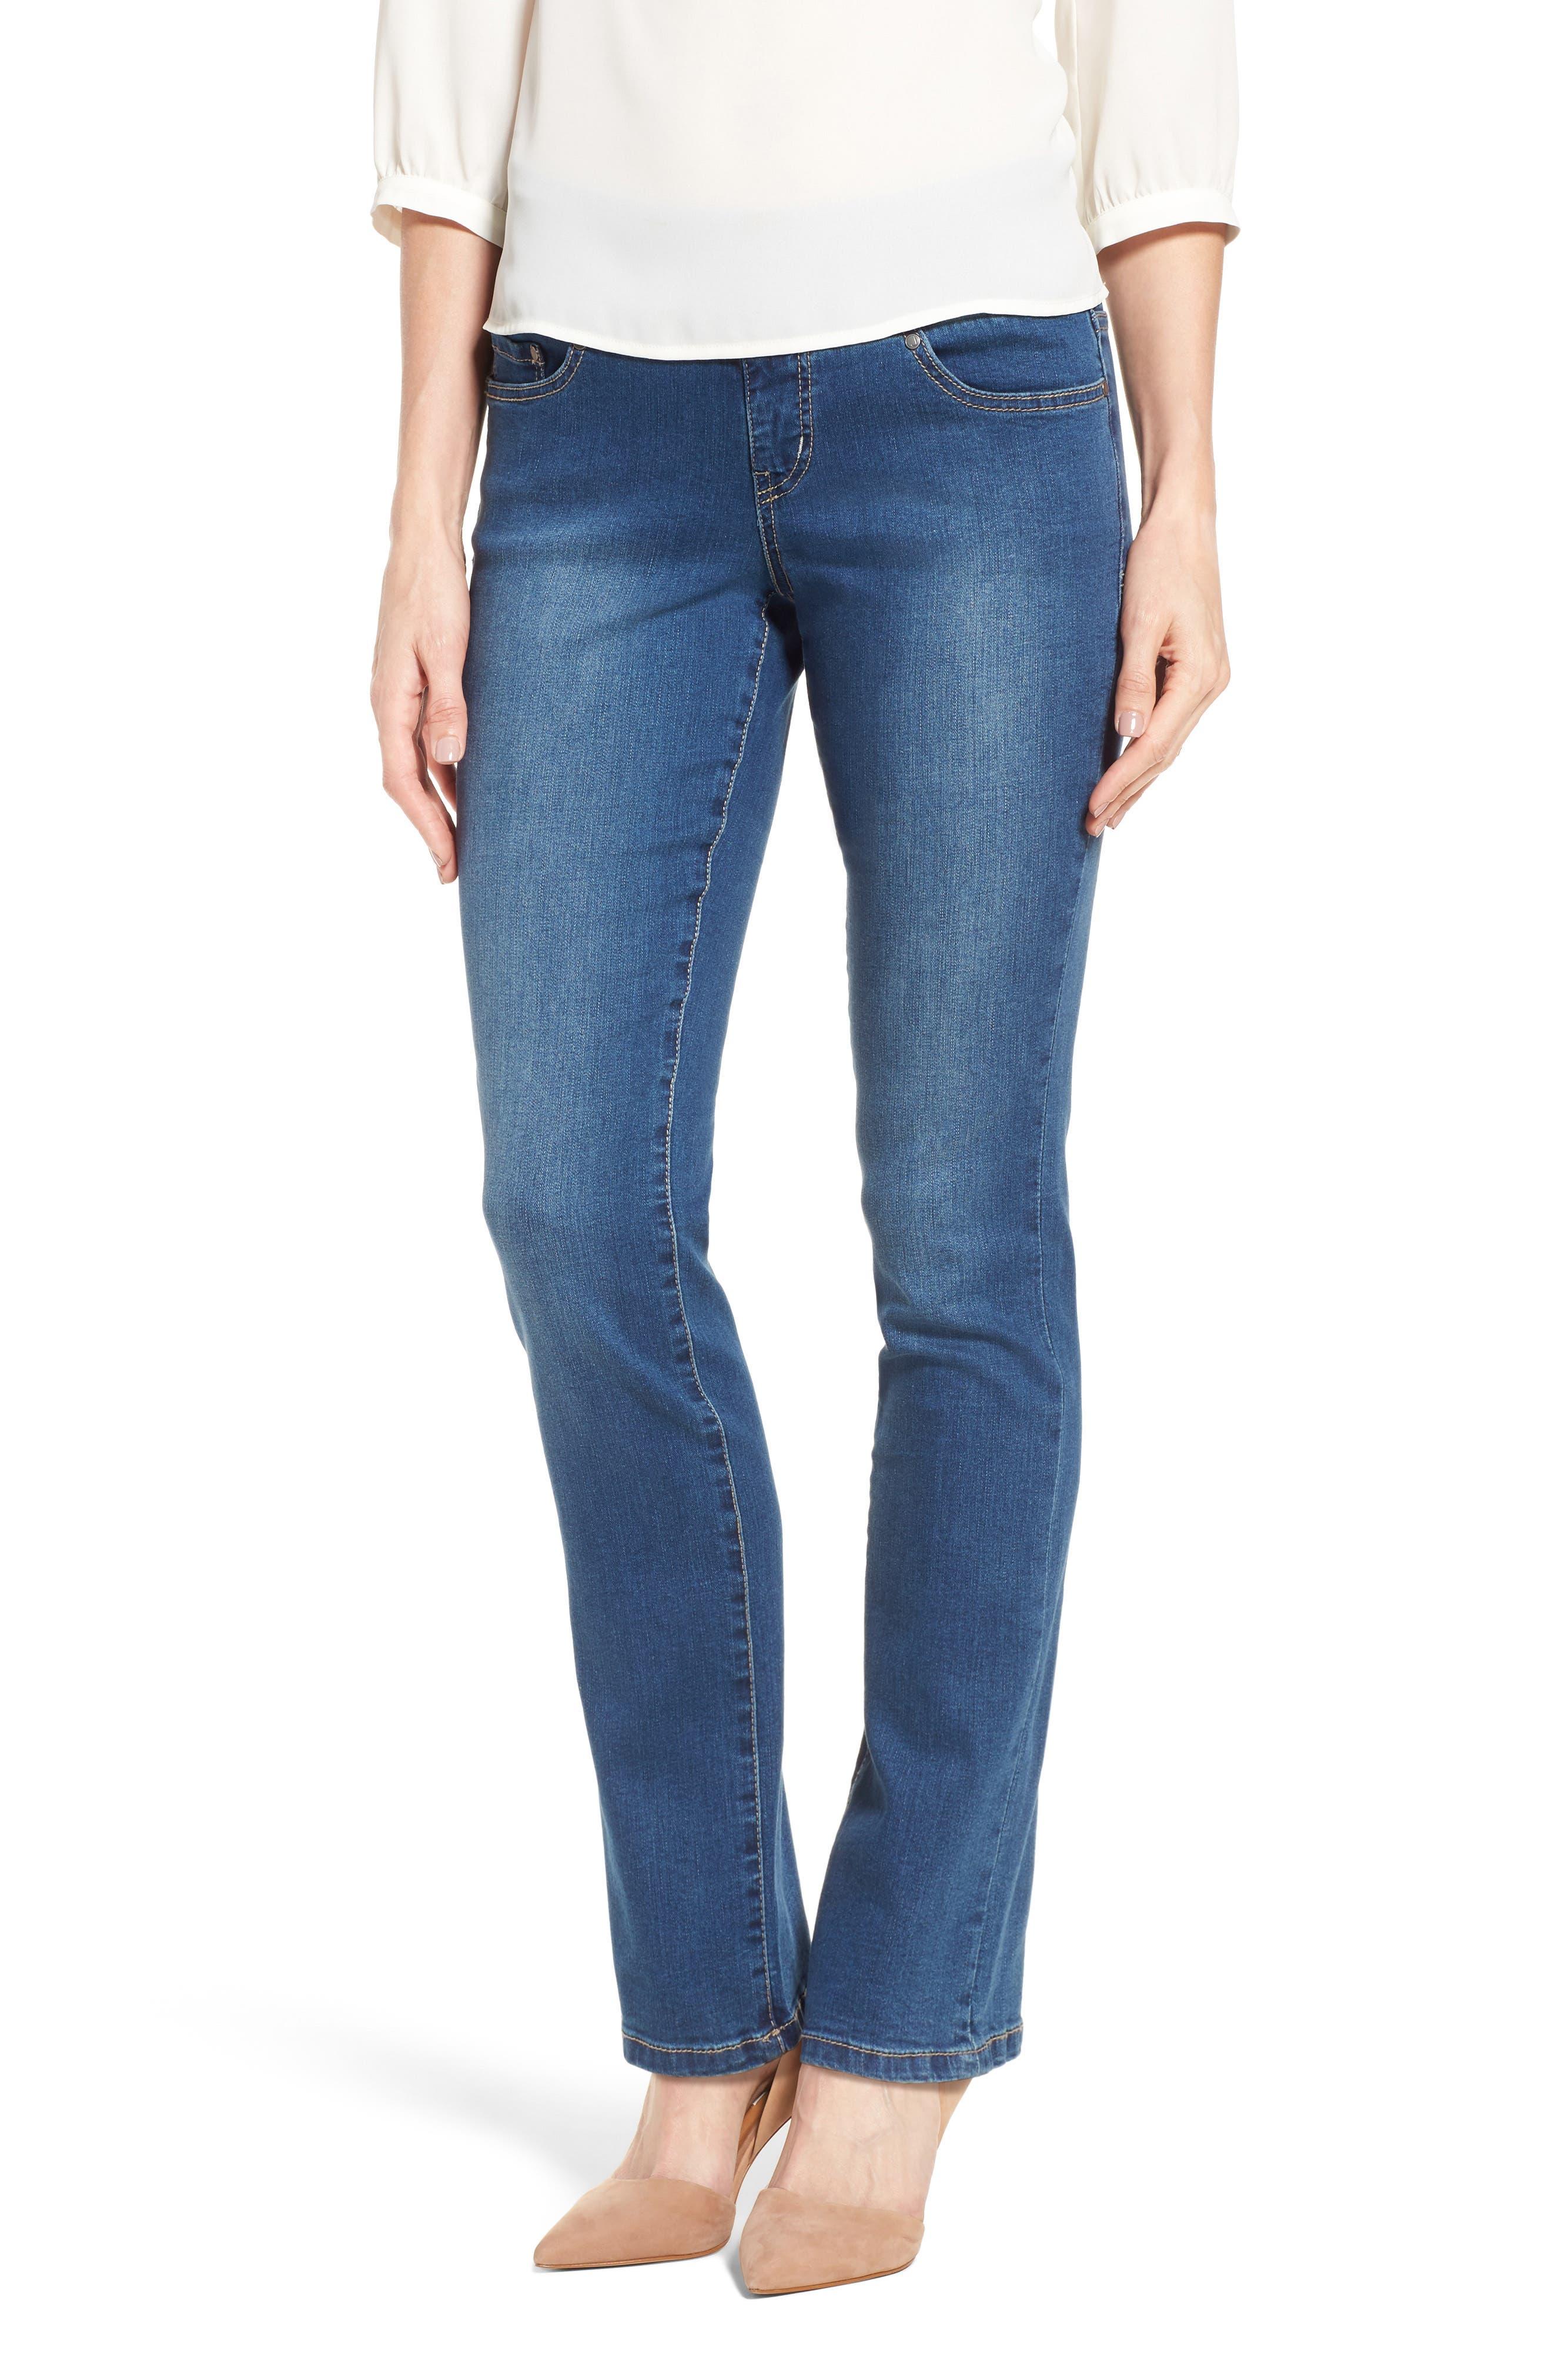 Peri Pull-On Straight Leg Jeans,                             Main thumbnail 1, color,                             MEDIUM INDIGO